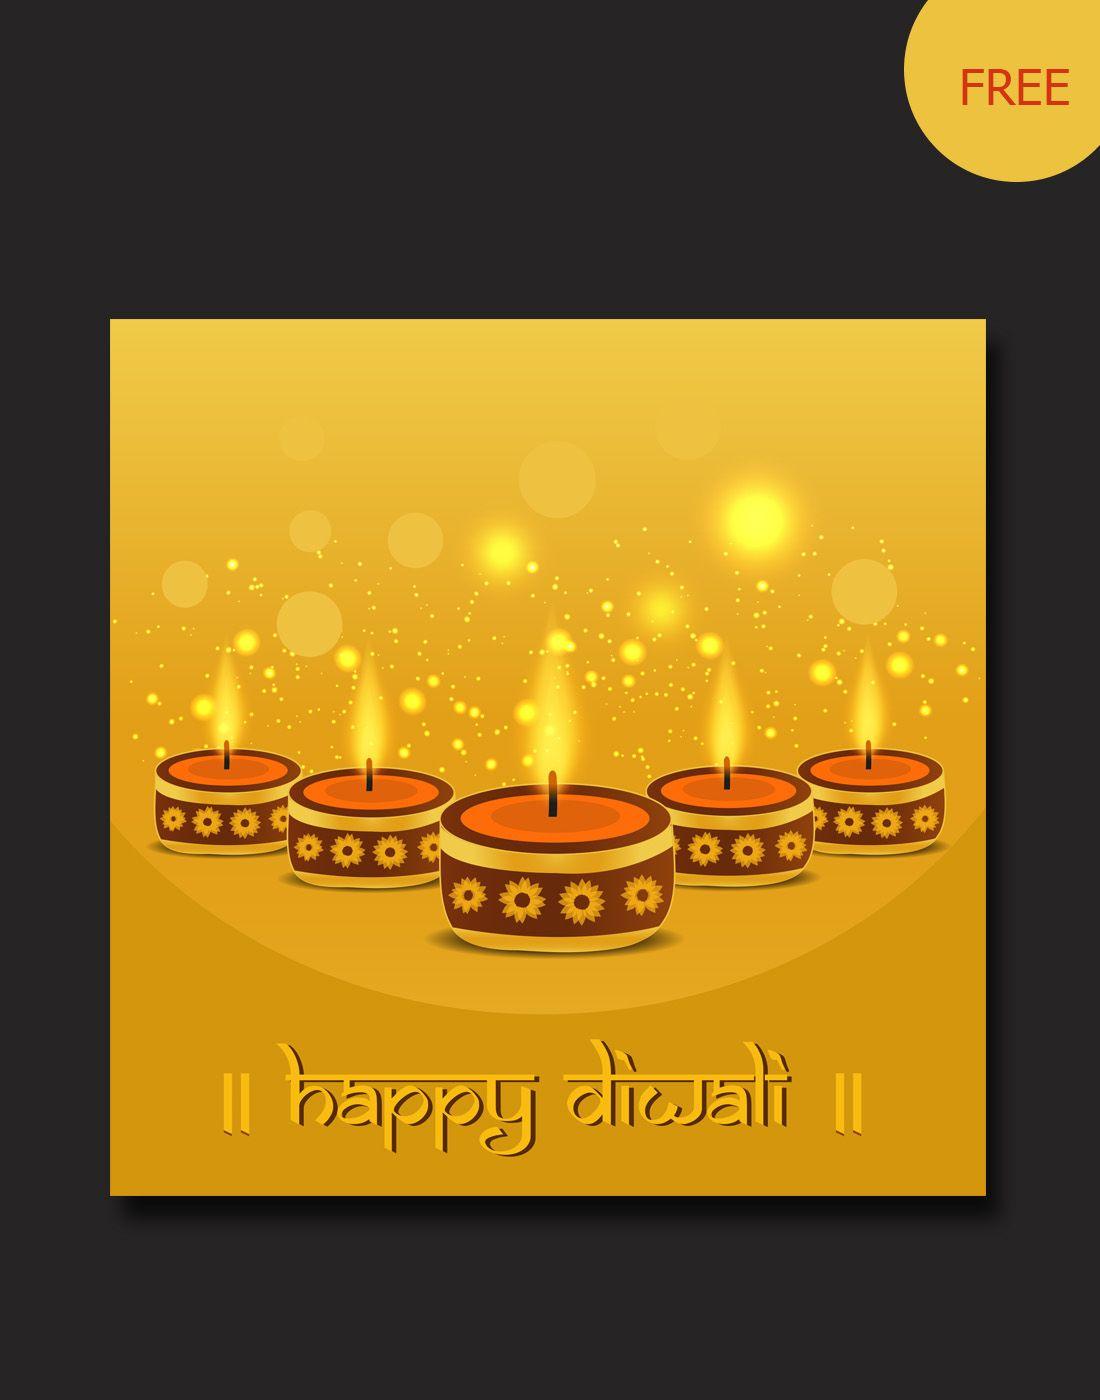 diwali greetings backgrounds | diwali vector templates | Pinterest ...